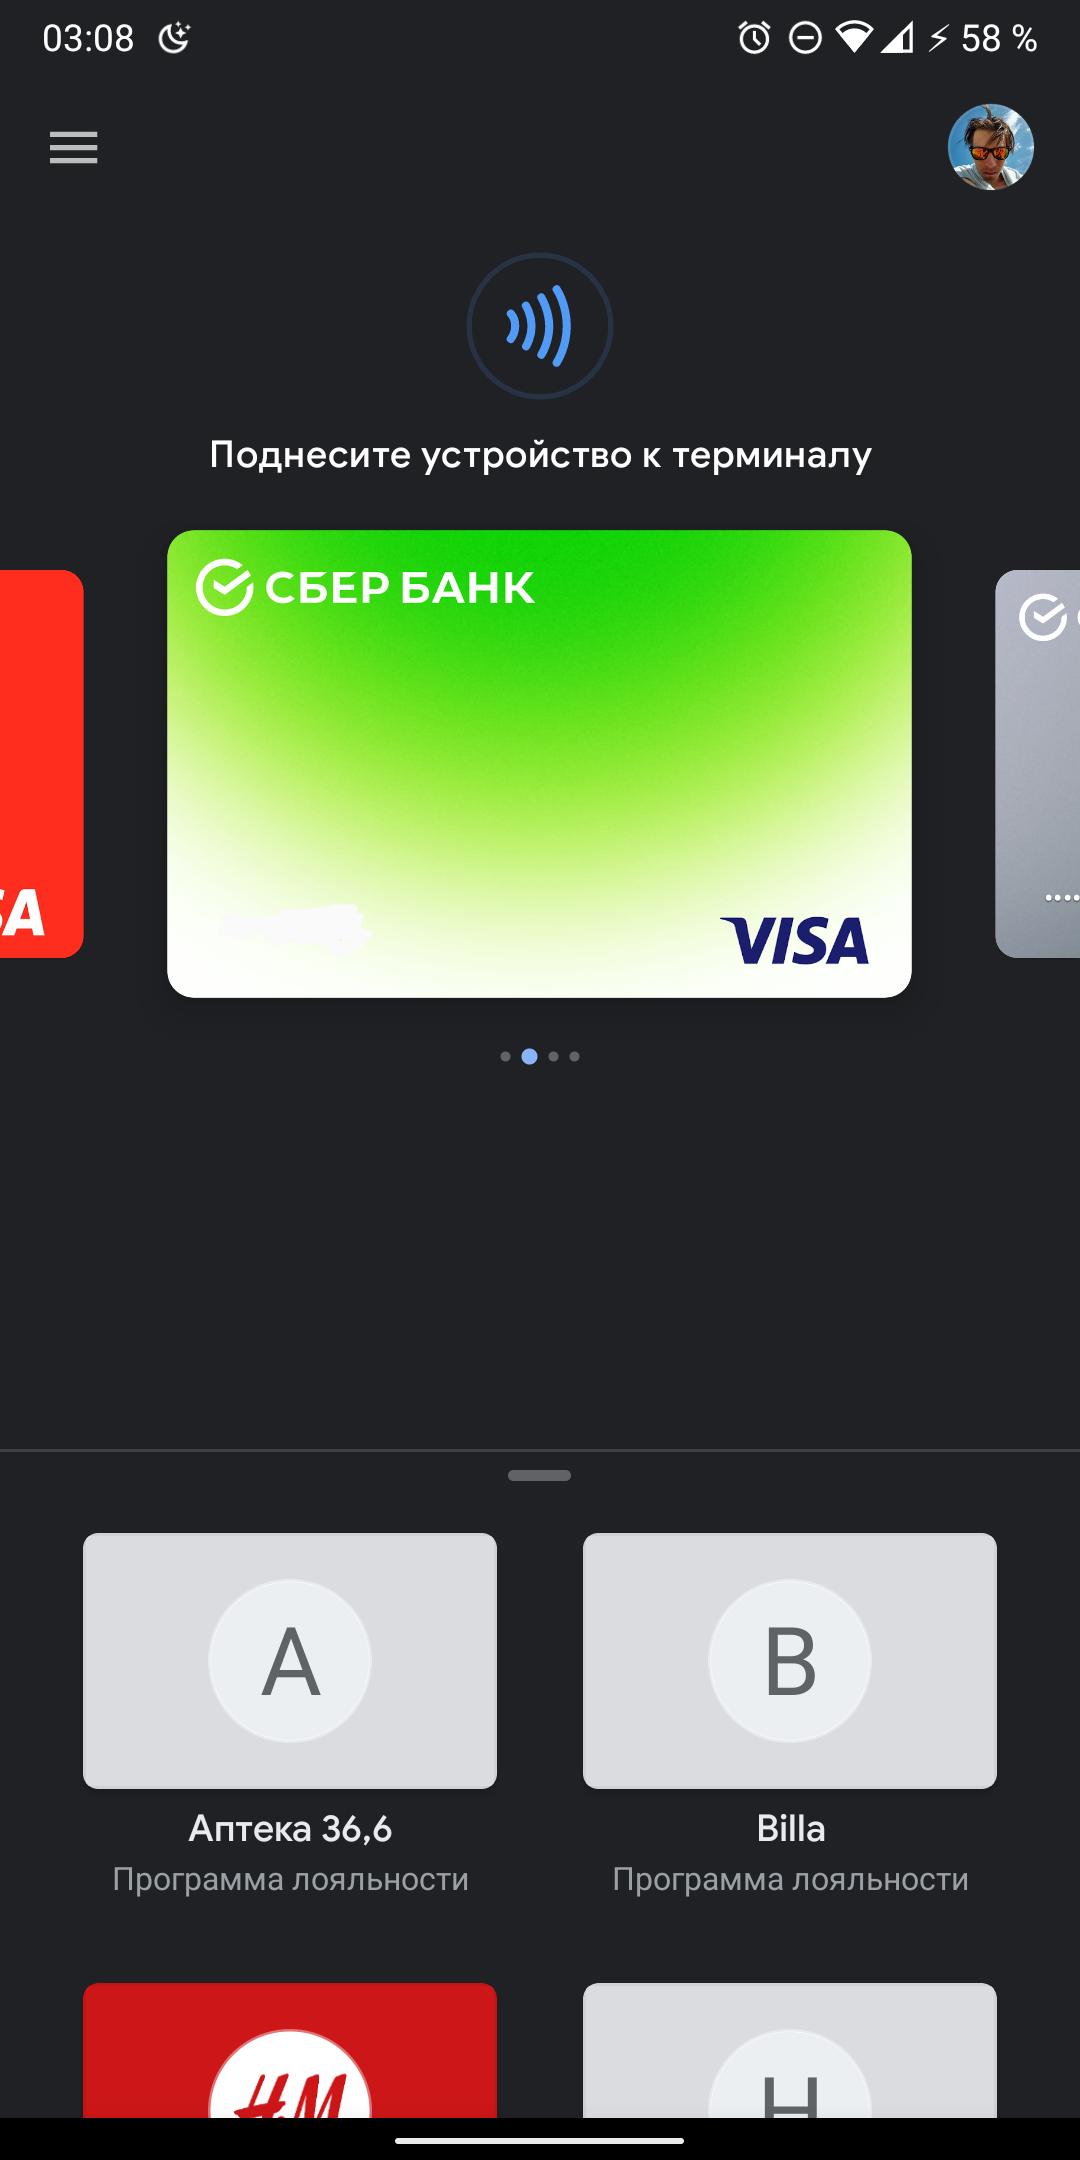 Screenshot_20210308-030856_Сервисы_Google_Play~2.png